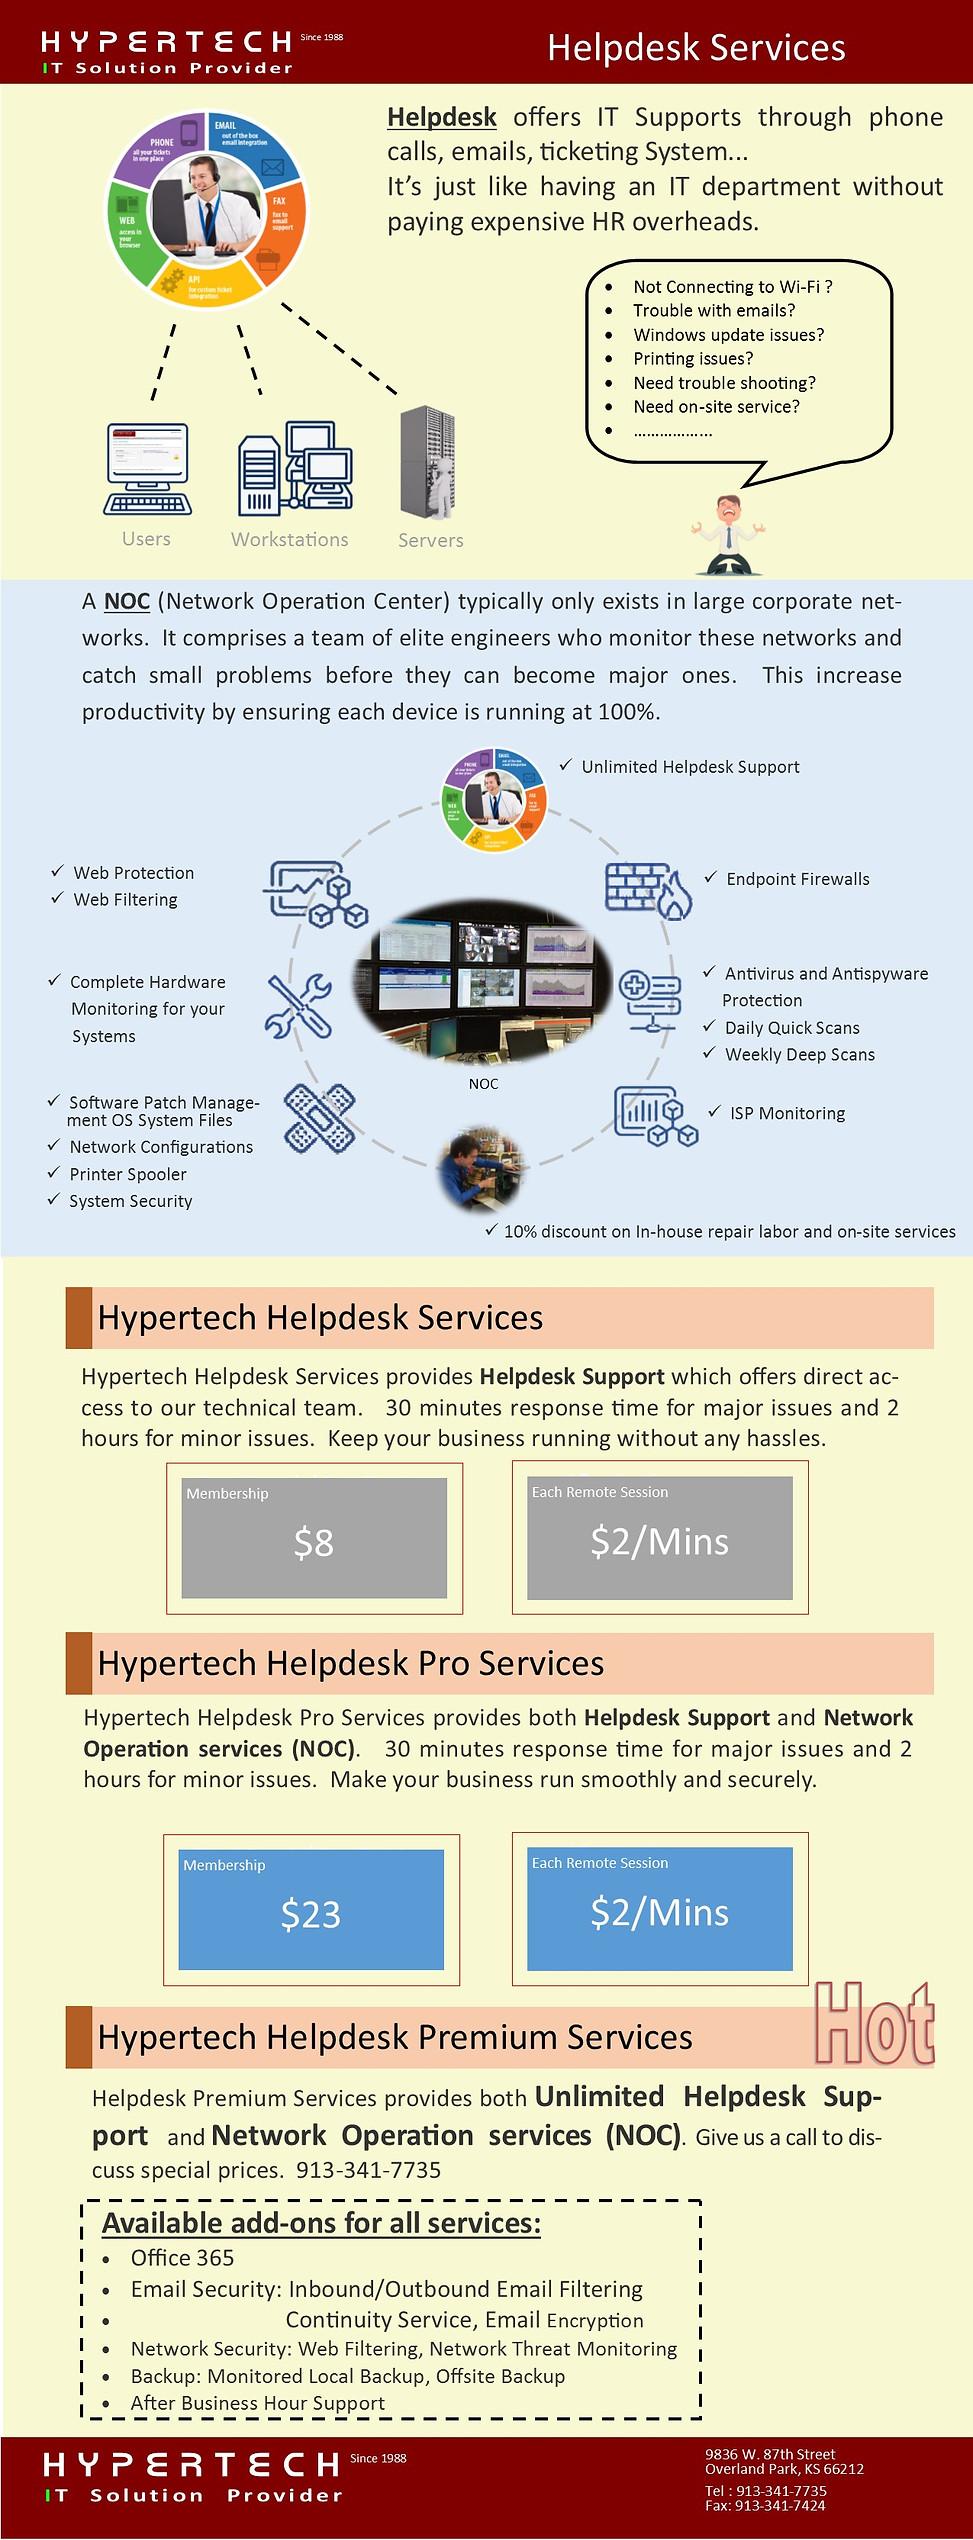 Helpdesk Services